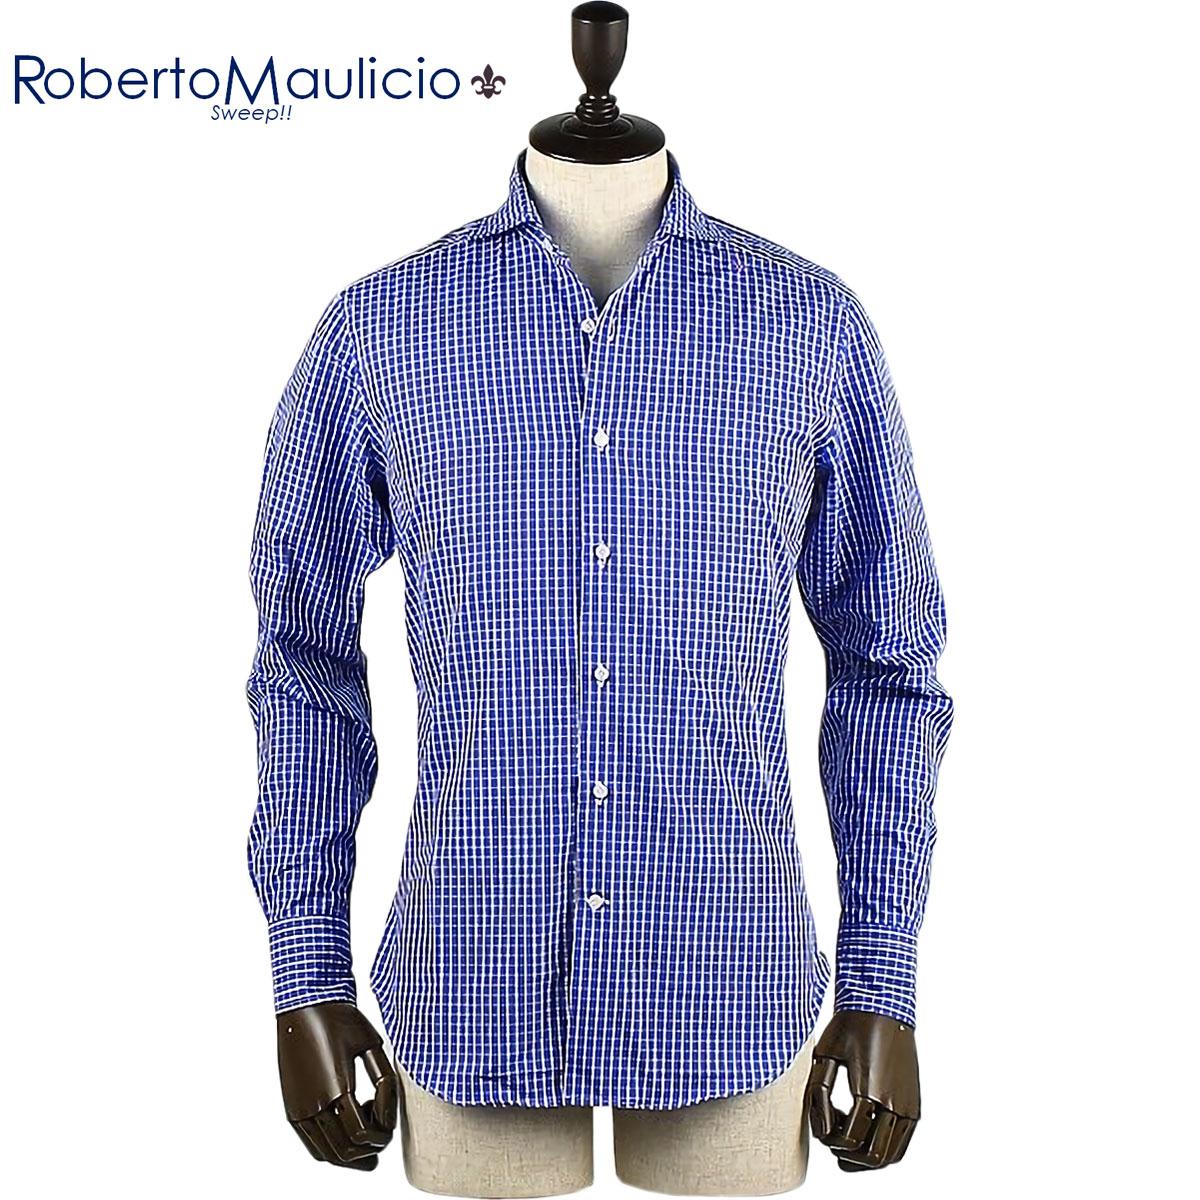 Roberto Maulicio Sweep!! / COTTON CHECK(BLUE)